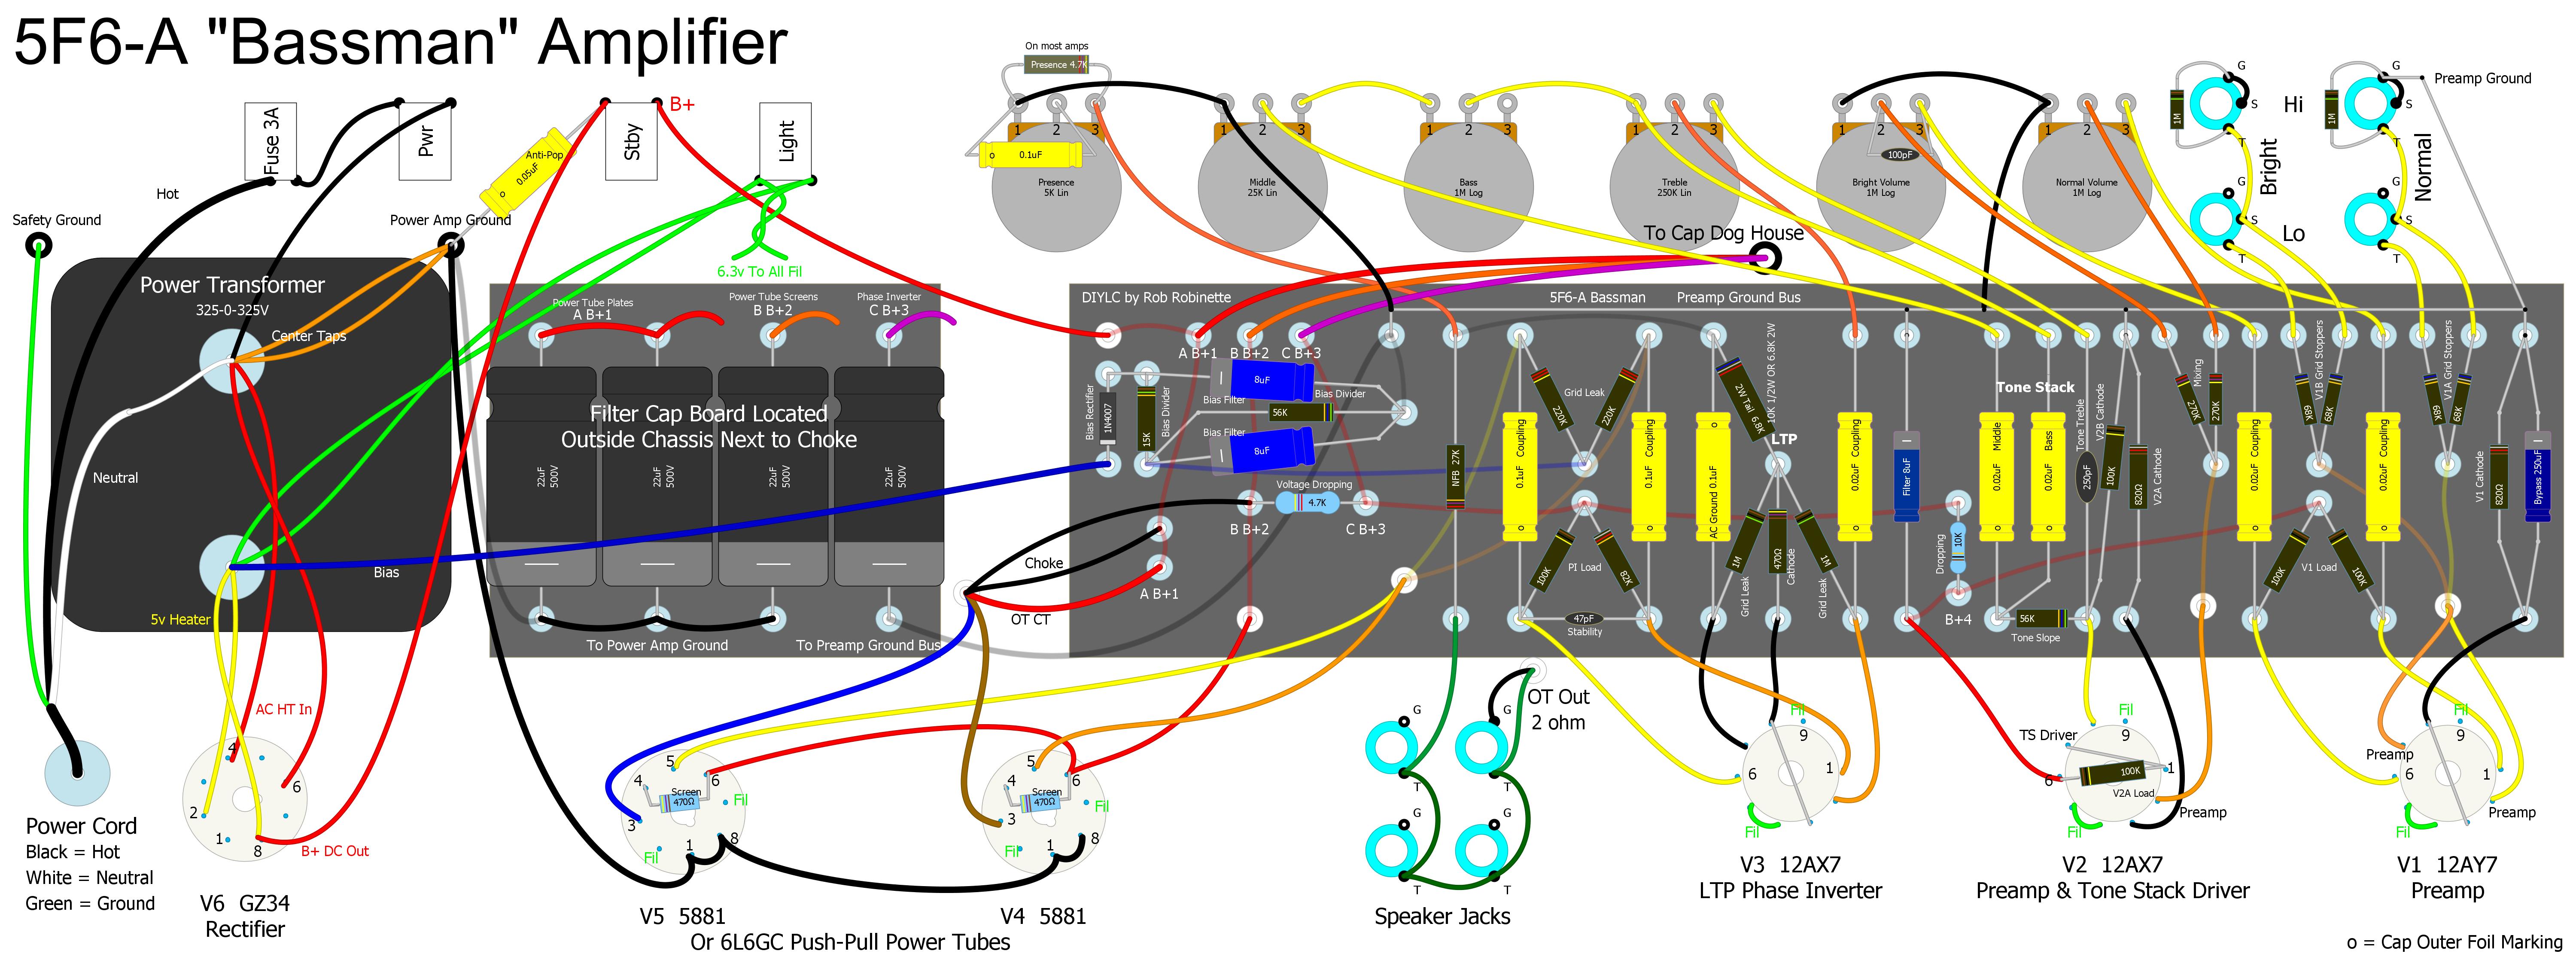 d9be46ed79e272a6bc7ac4e0f07fda10 Hand Wired Tube Amp Wiring Diagram on